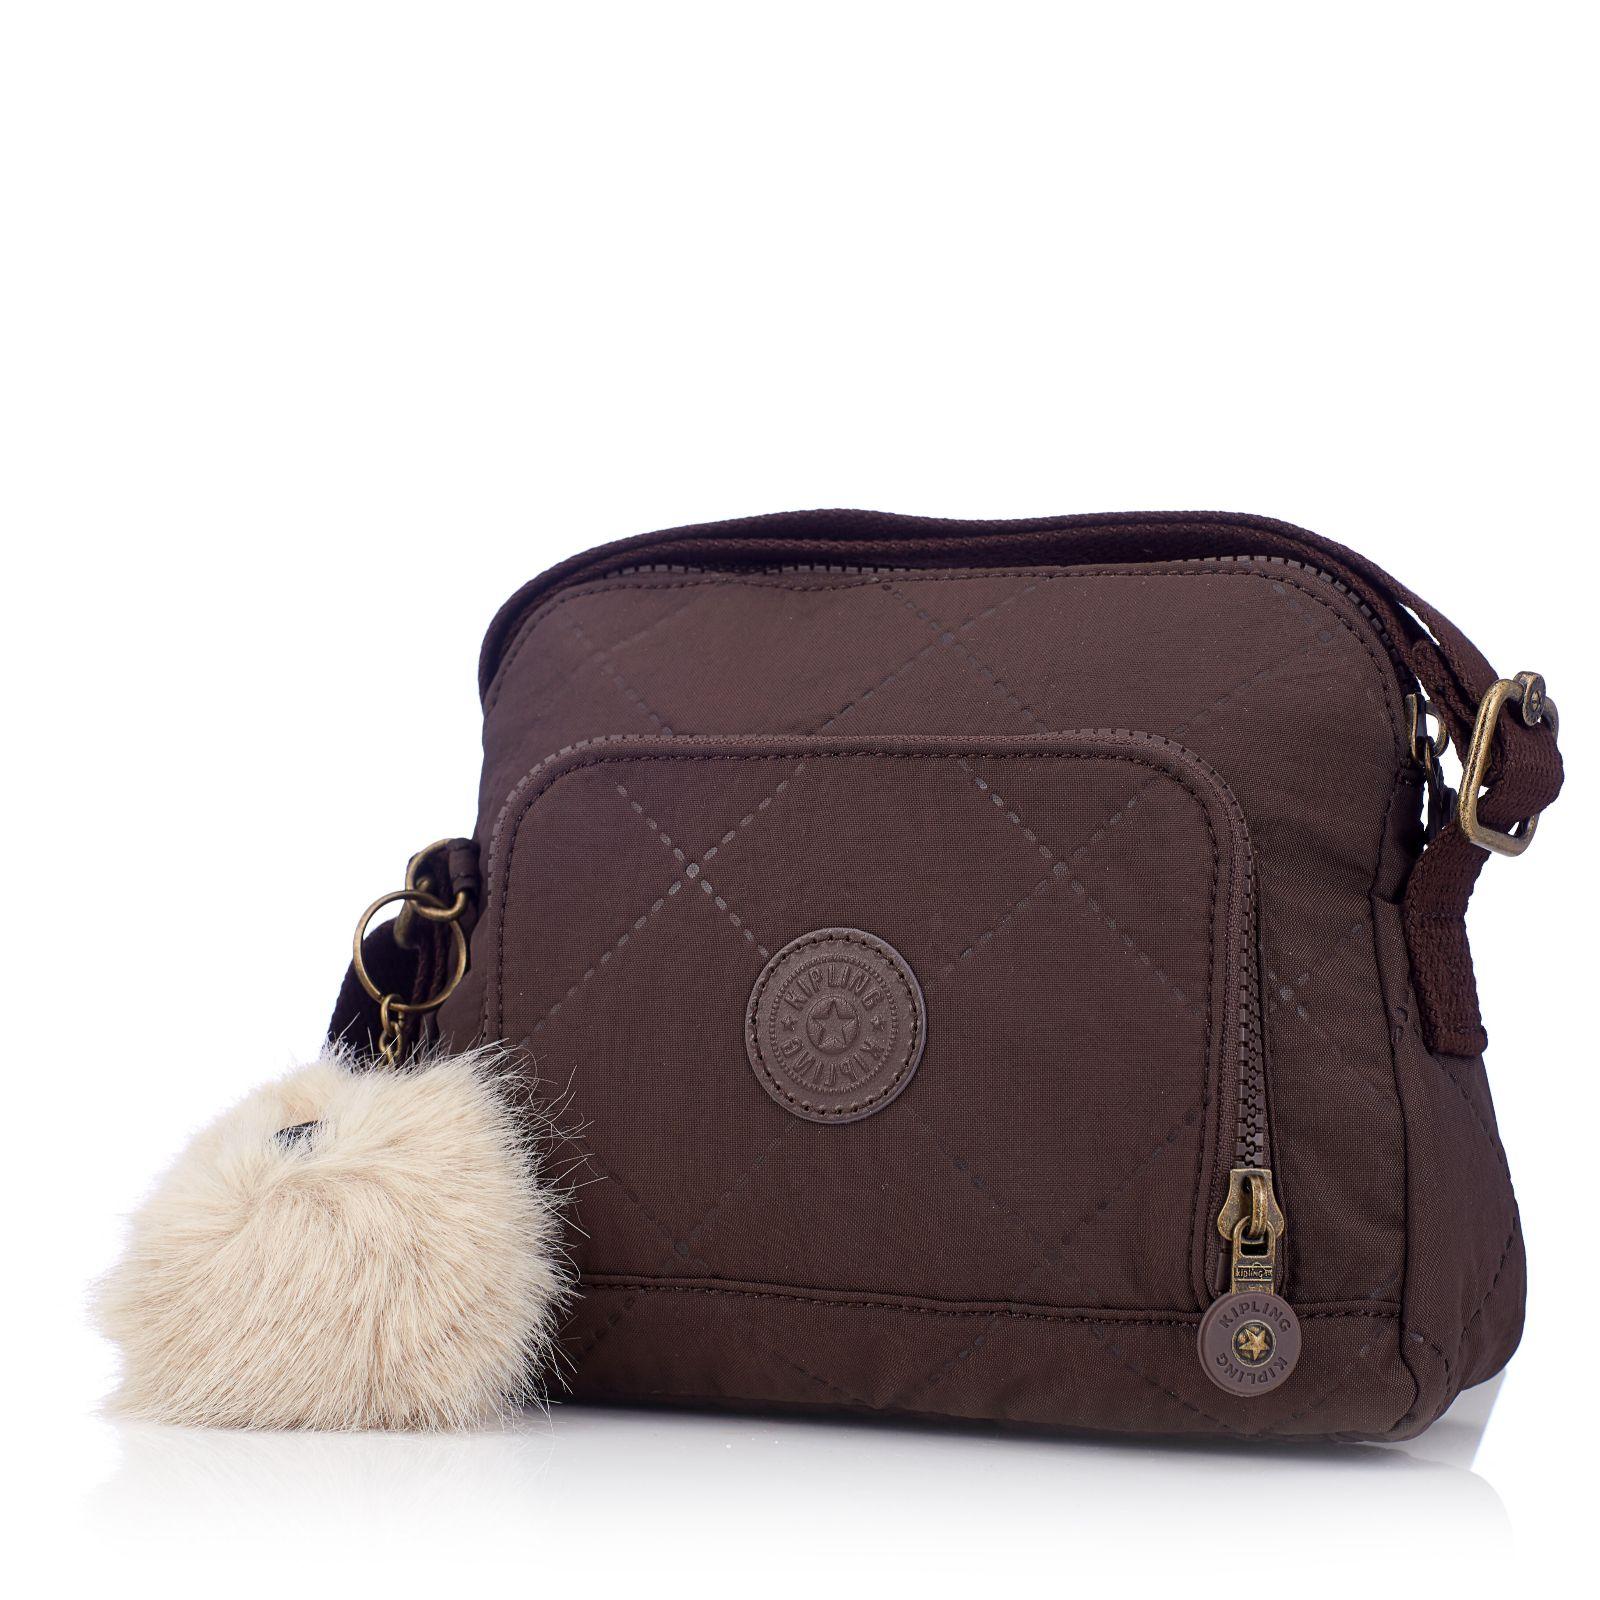 3265c724f6 Kipling Wiske Premium Small Crossbody Bag   Adjustable Strap - QVC UK